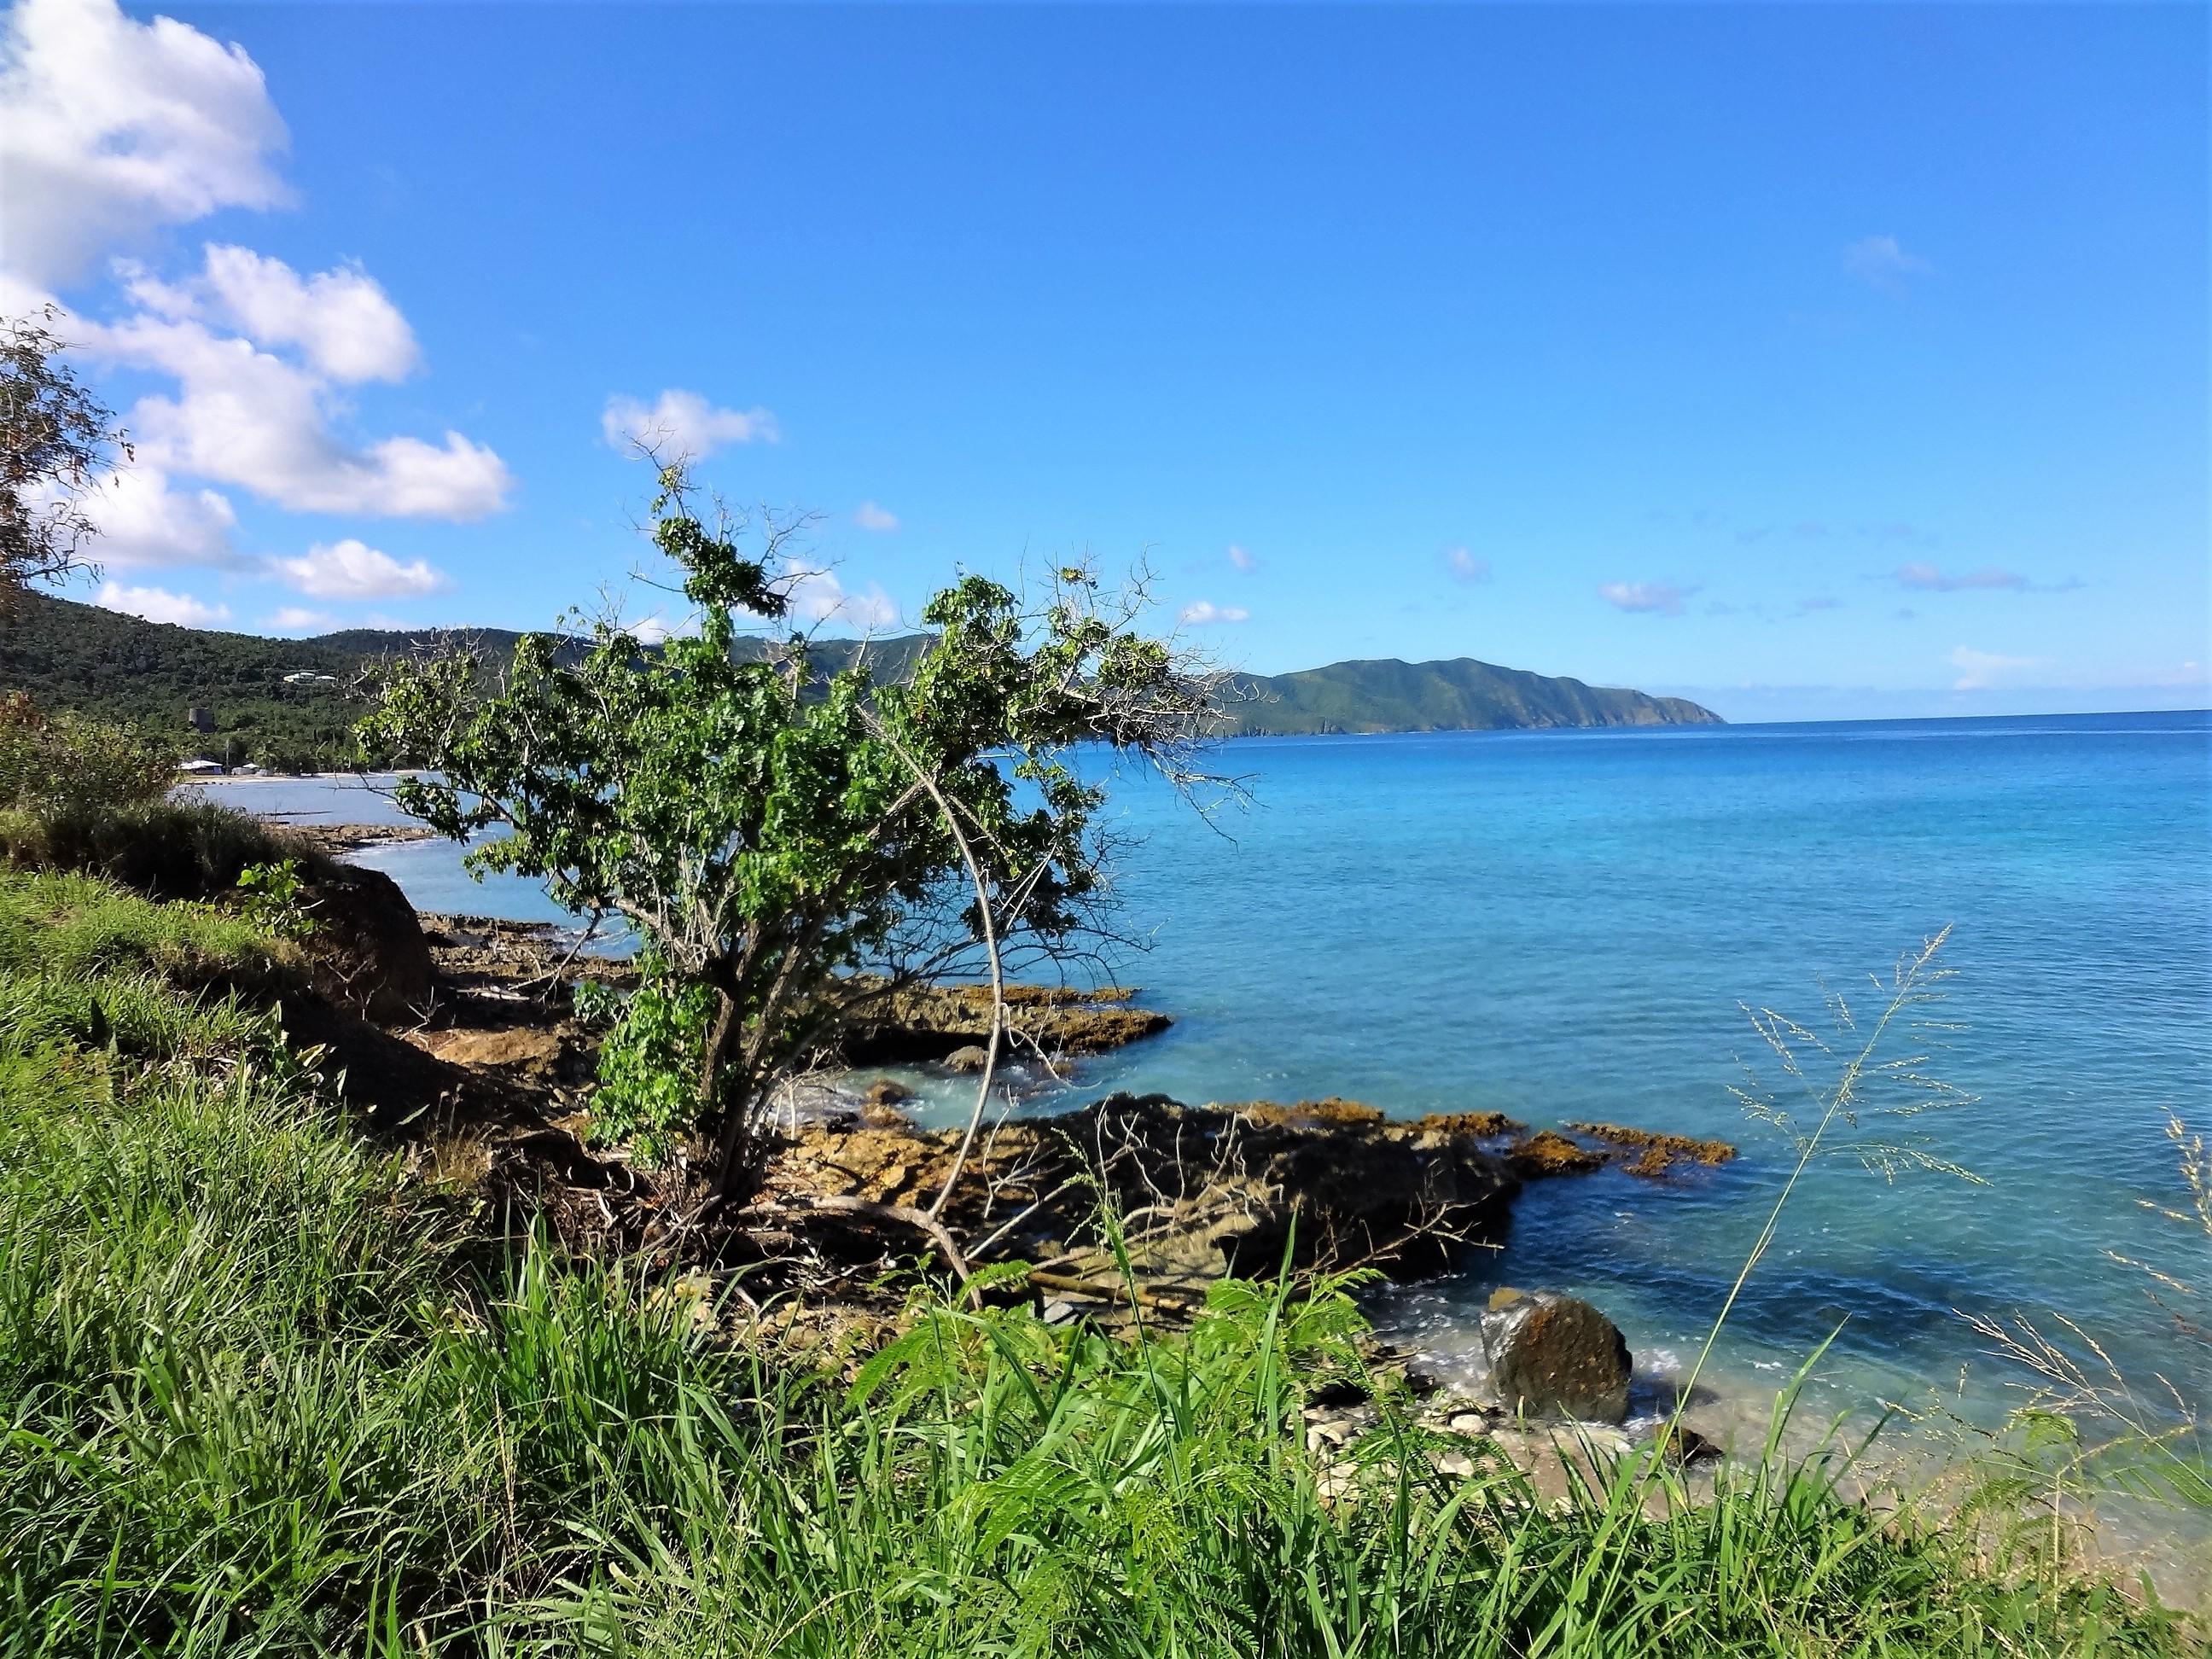 Land for Sale at 112 B Cane Bay NB 112 B Cane Bay NB St Croix, Virgin Islands 00840 United States Virgin Islands